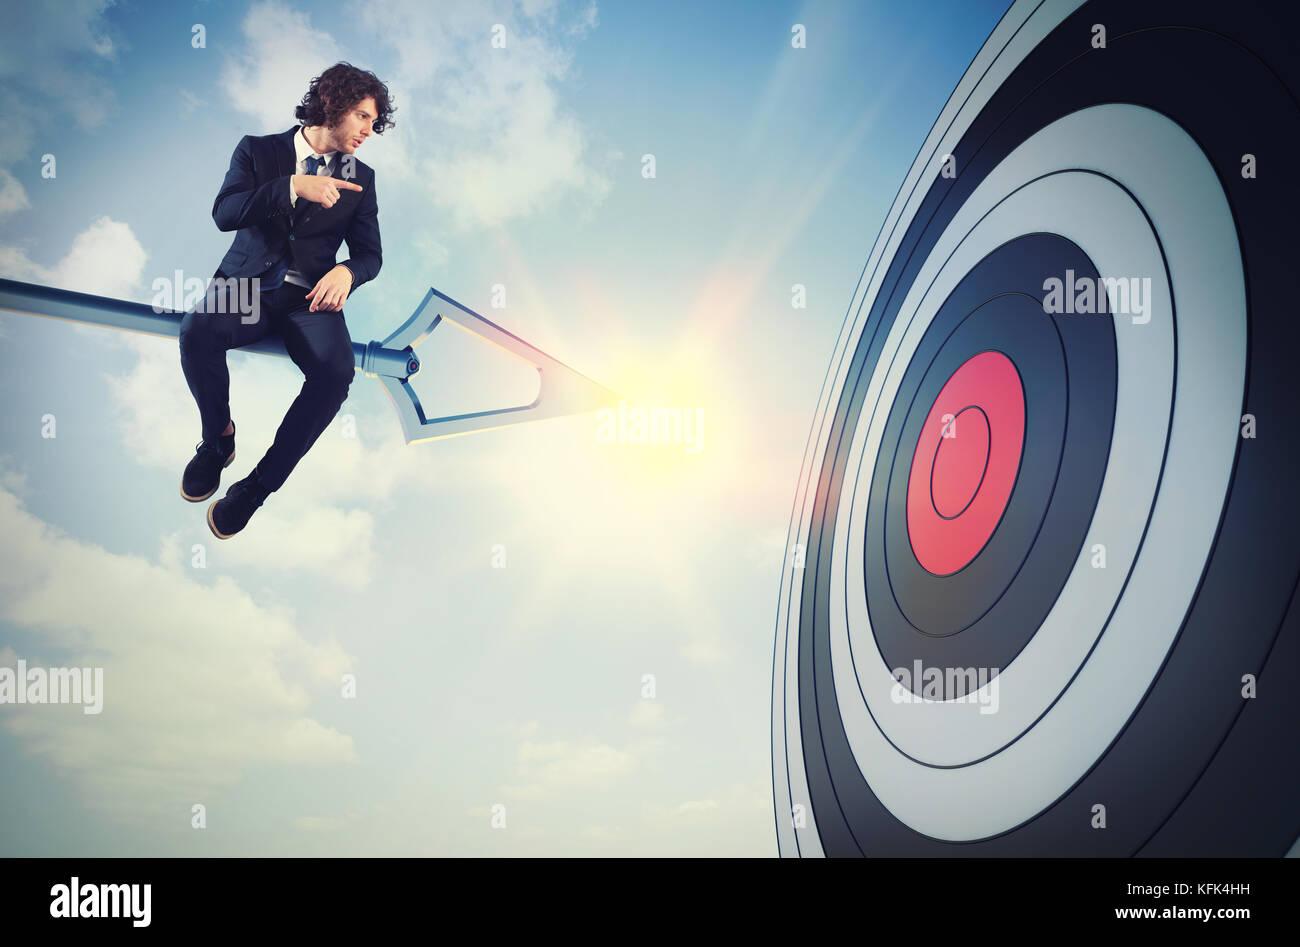 Businessman's skill Stock Photo